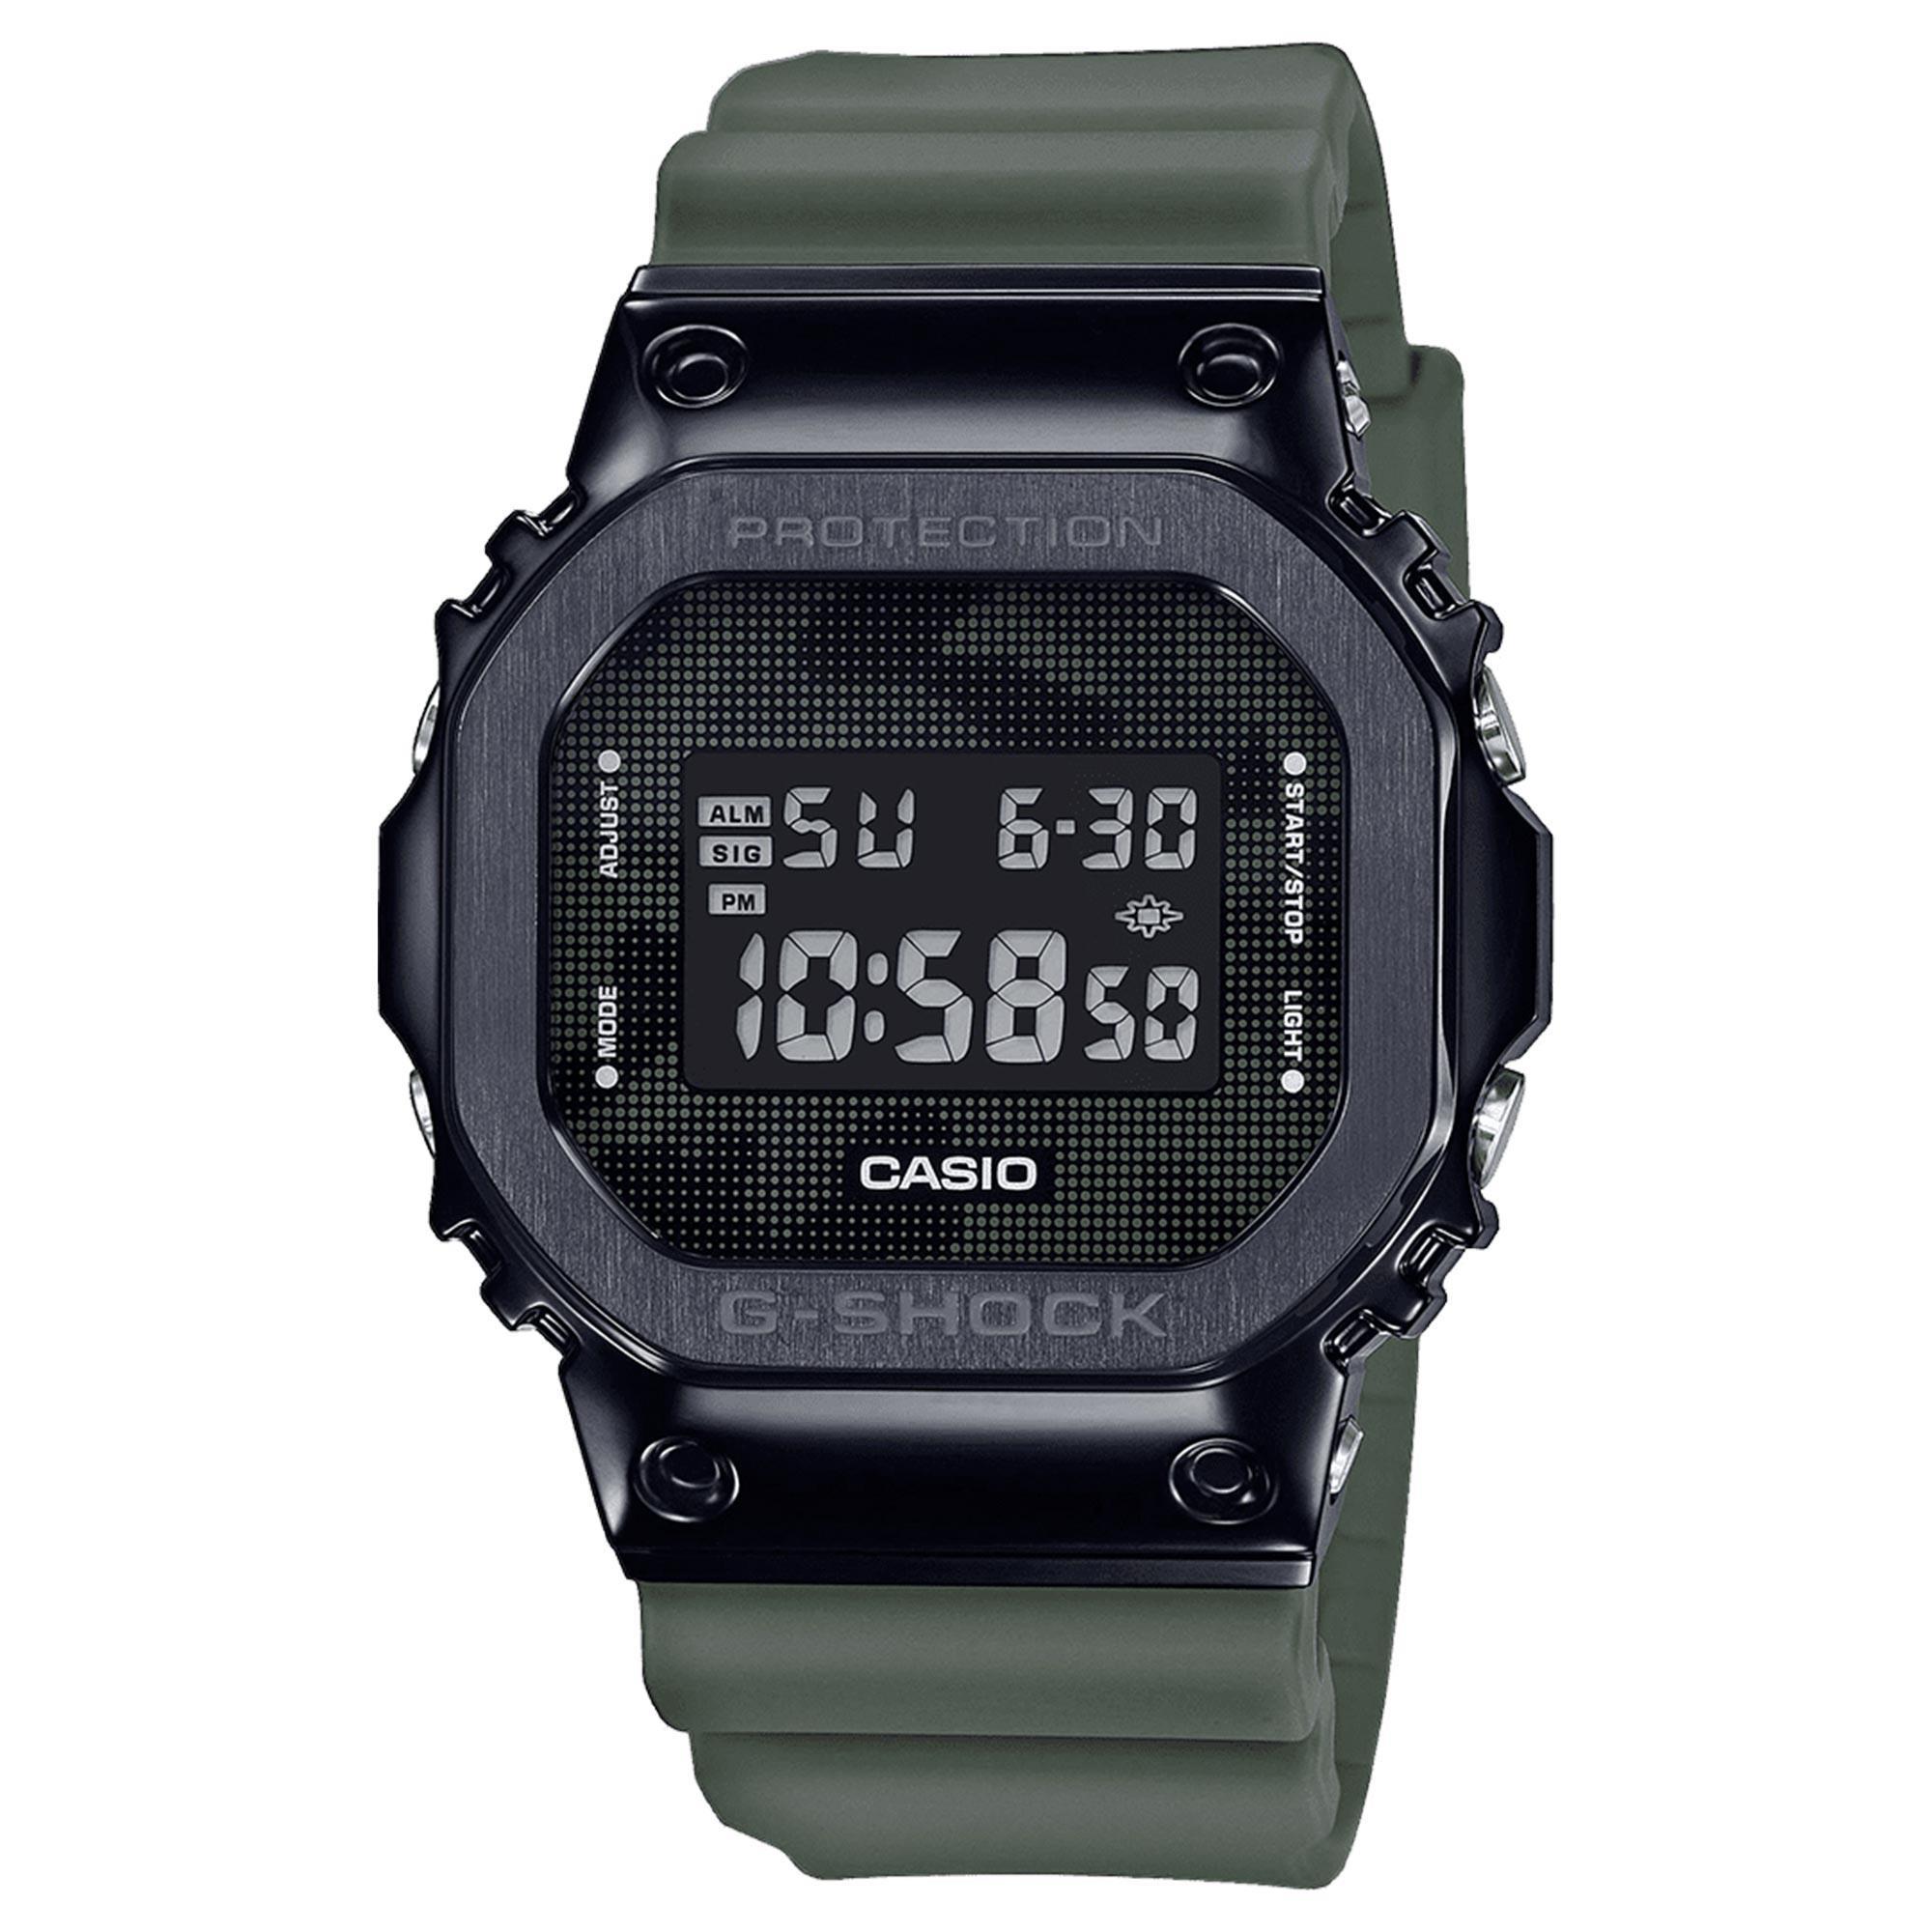 Casio G-Shock Metal Bezel Series Quartz Digital LCD Dial Green Resin Strap Men's Watch GM-5600B-3ER RRP £199